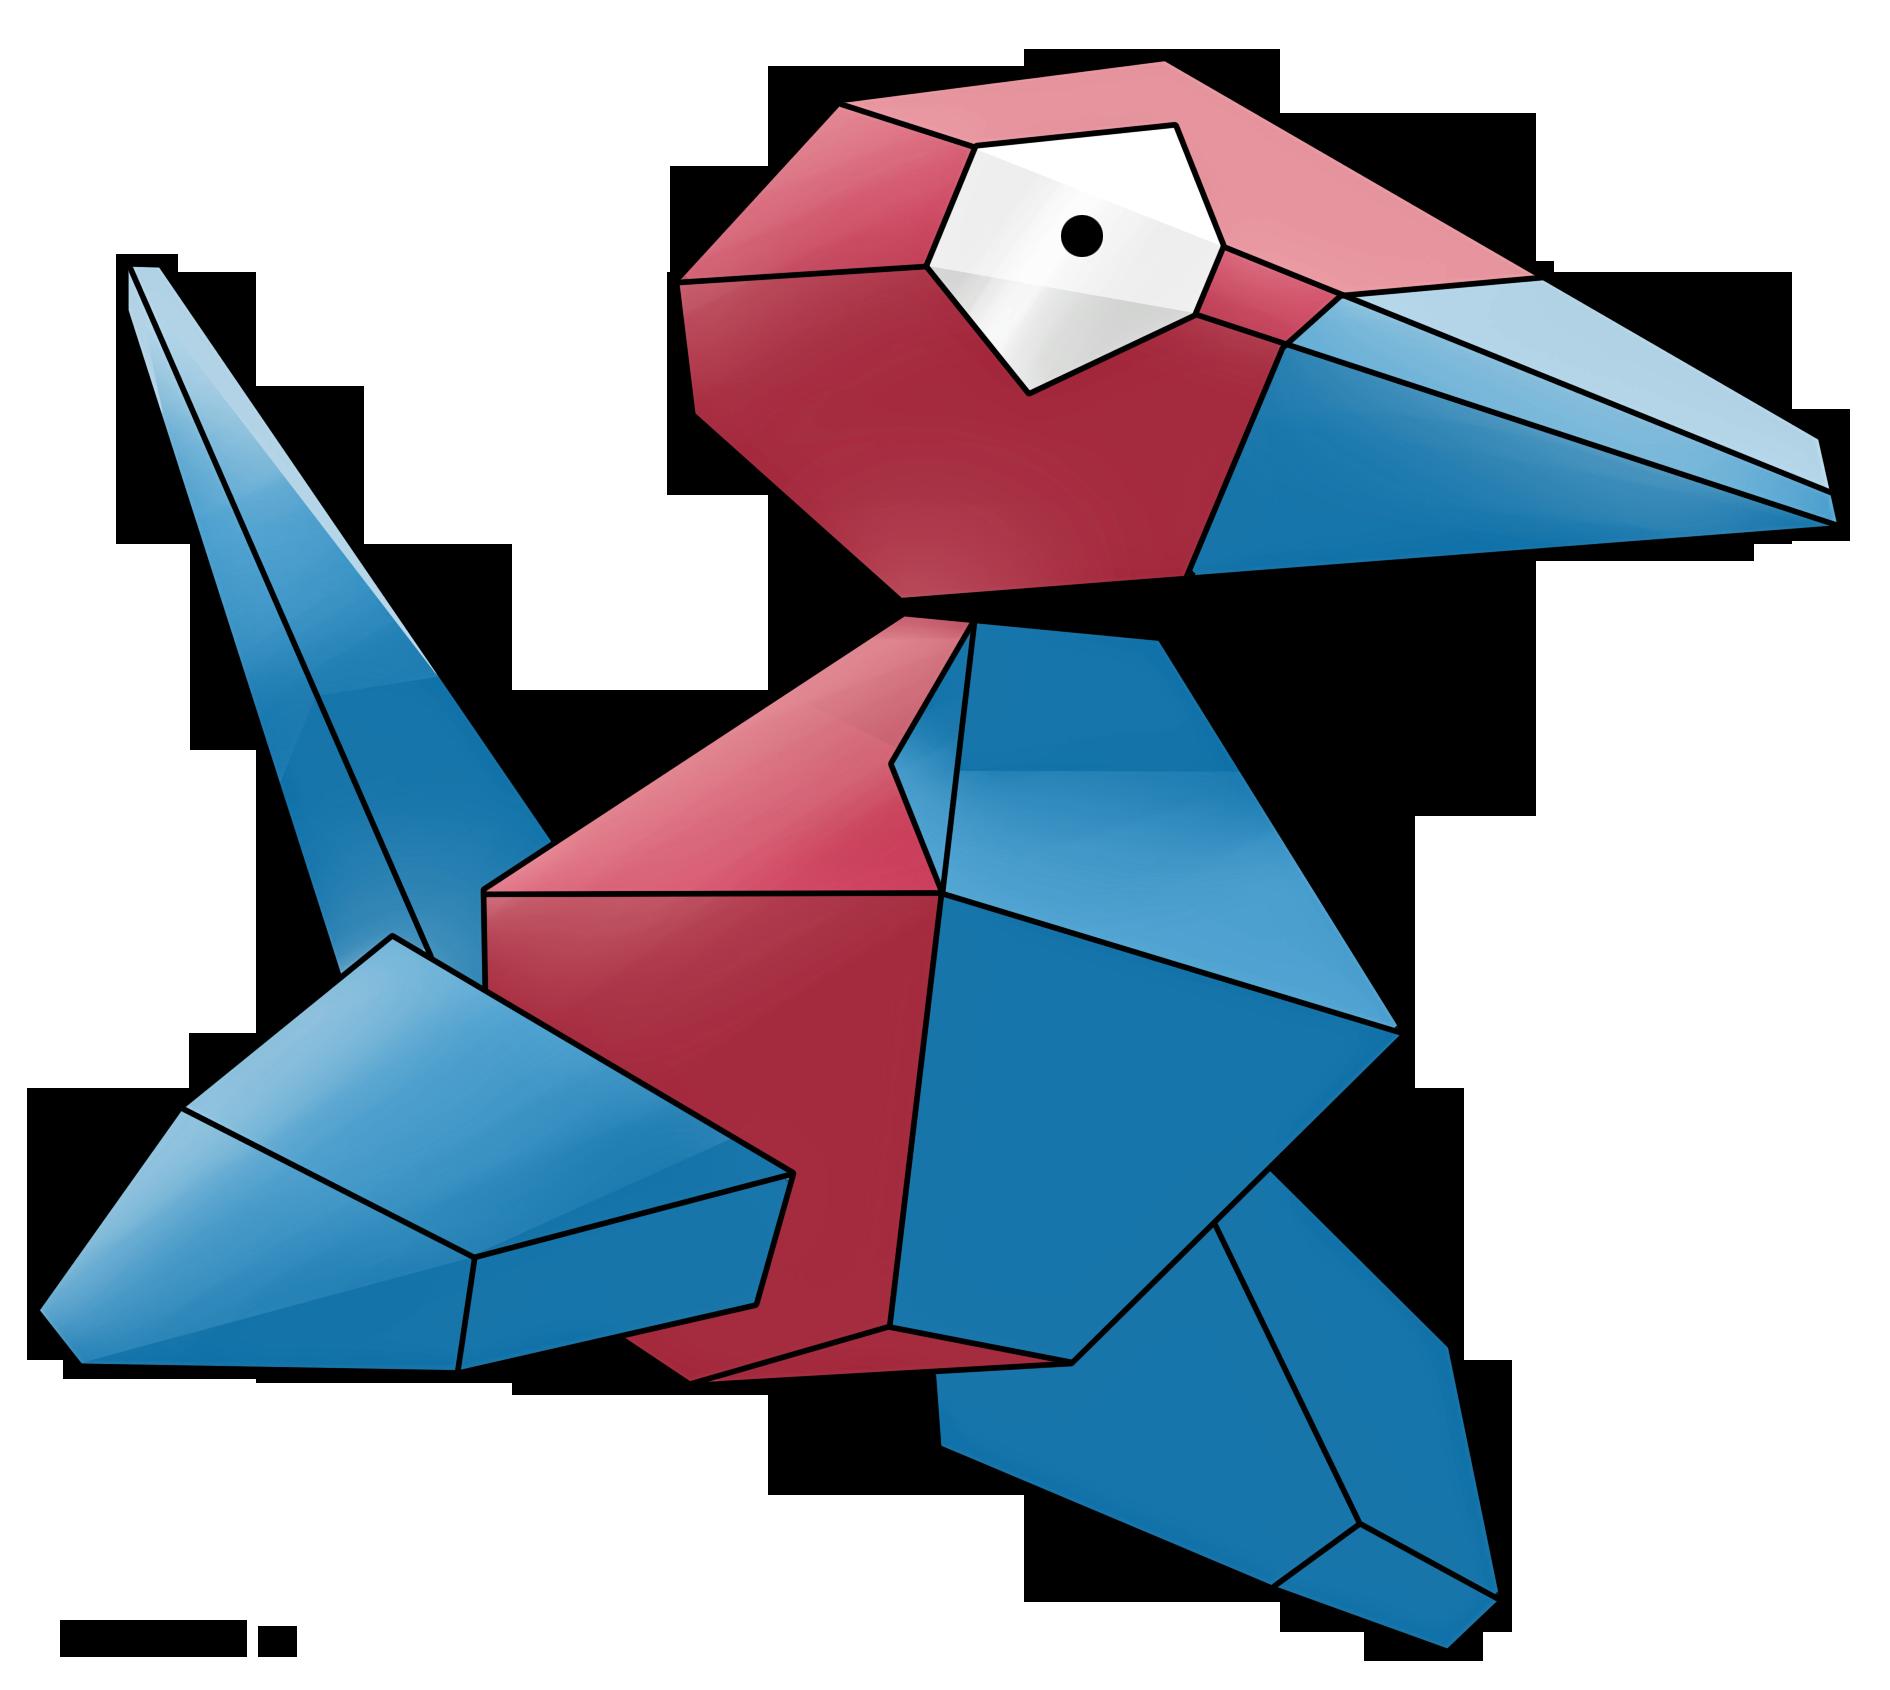 Porygon Images | Pokemon Images